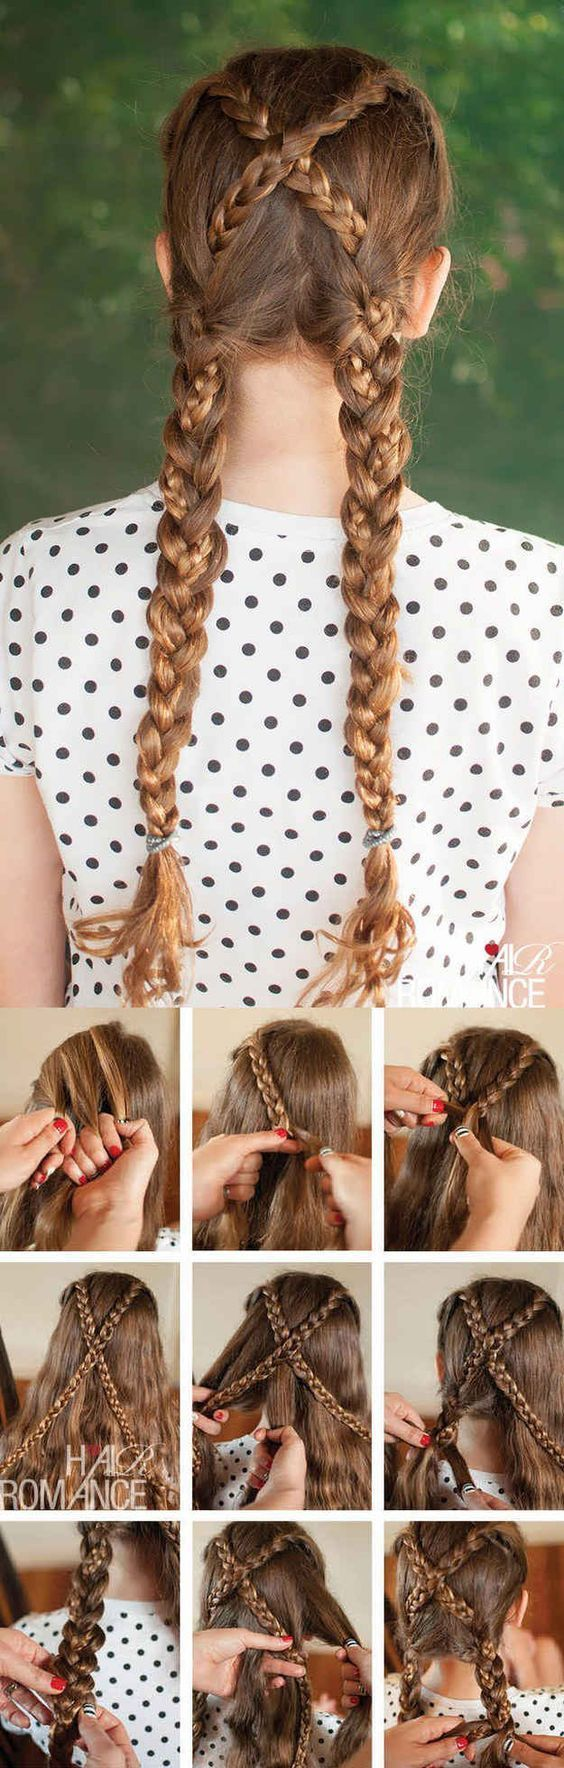 beautiful hair tutorials to unleash your inner disney princess